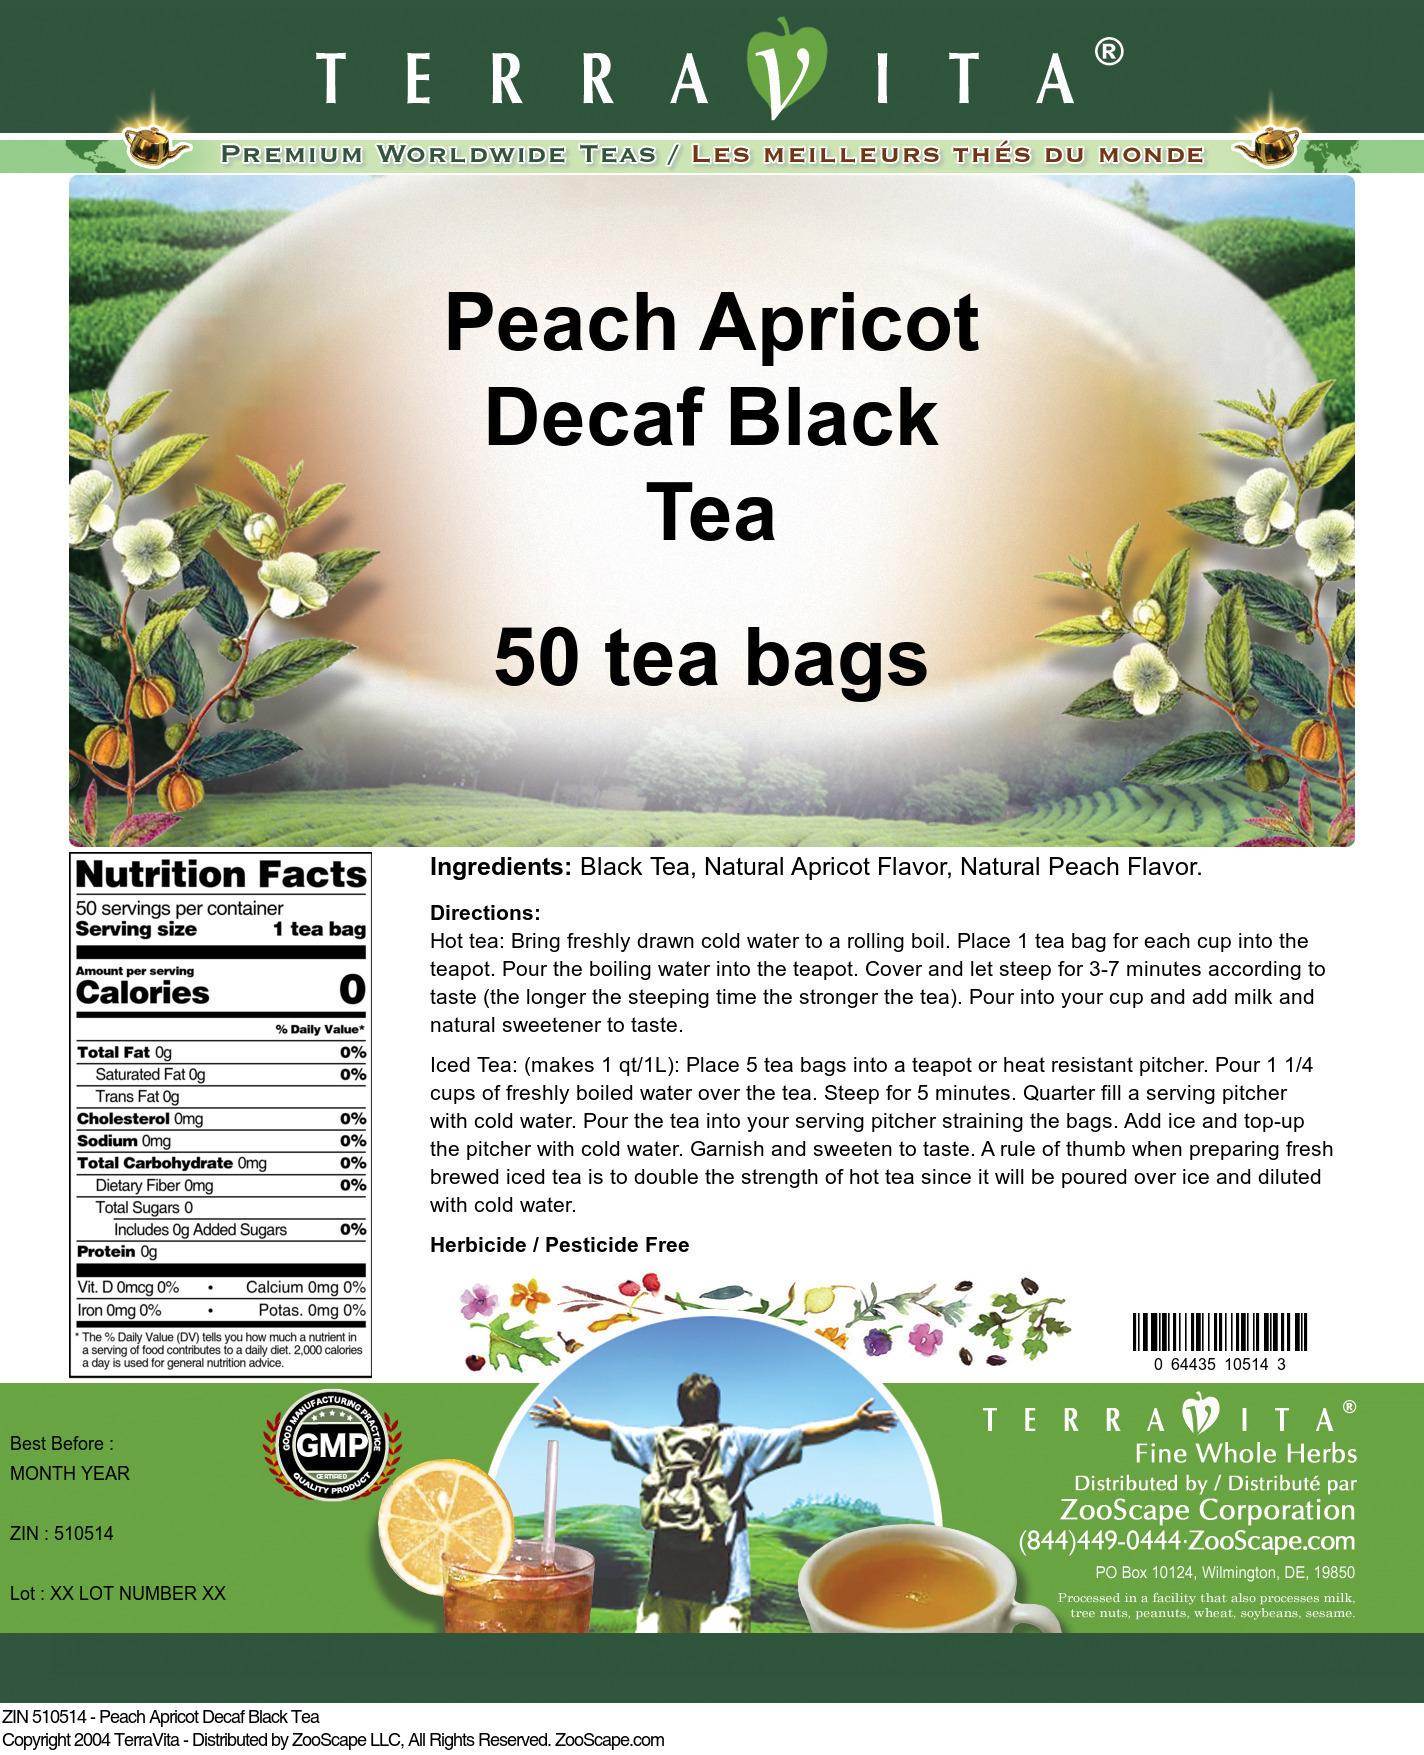 Peach Apricot Decaf Black Tea